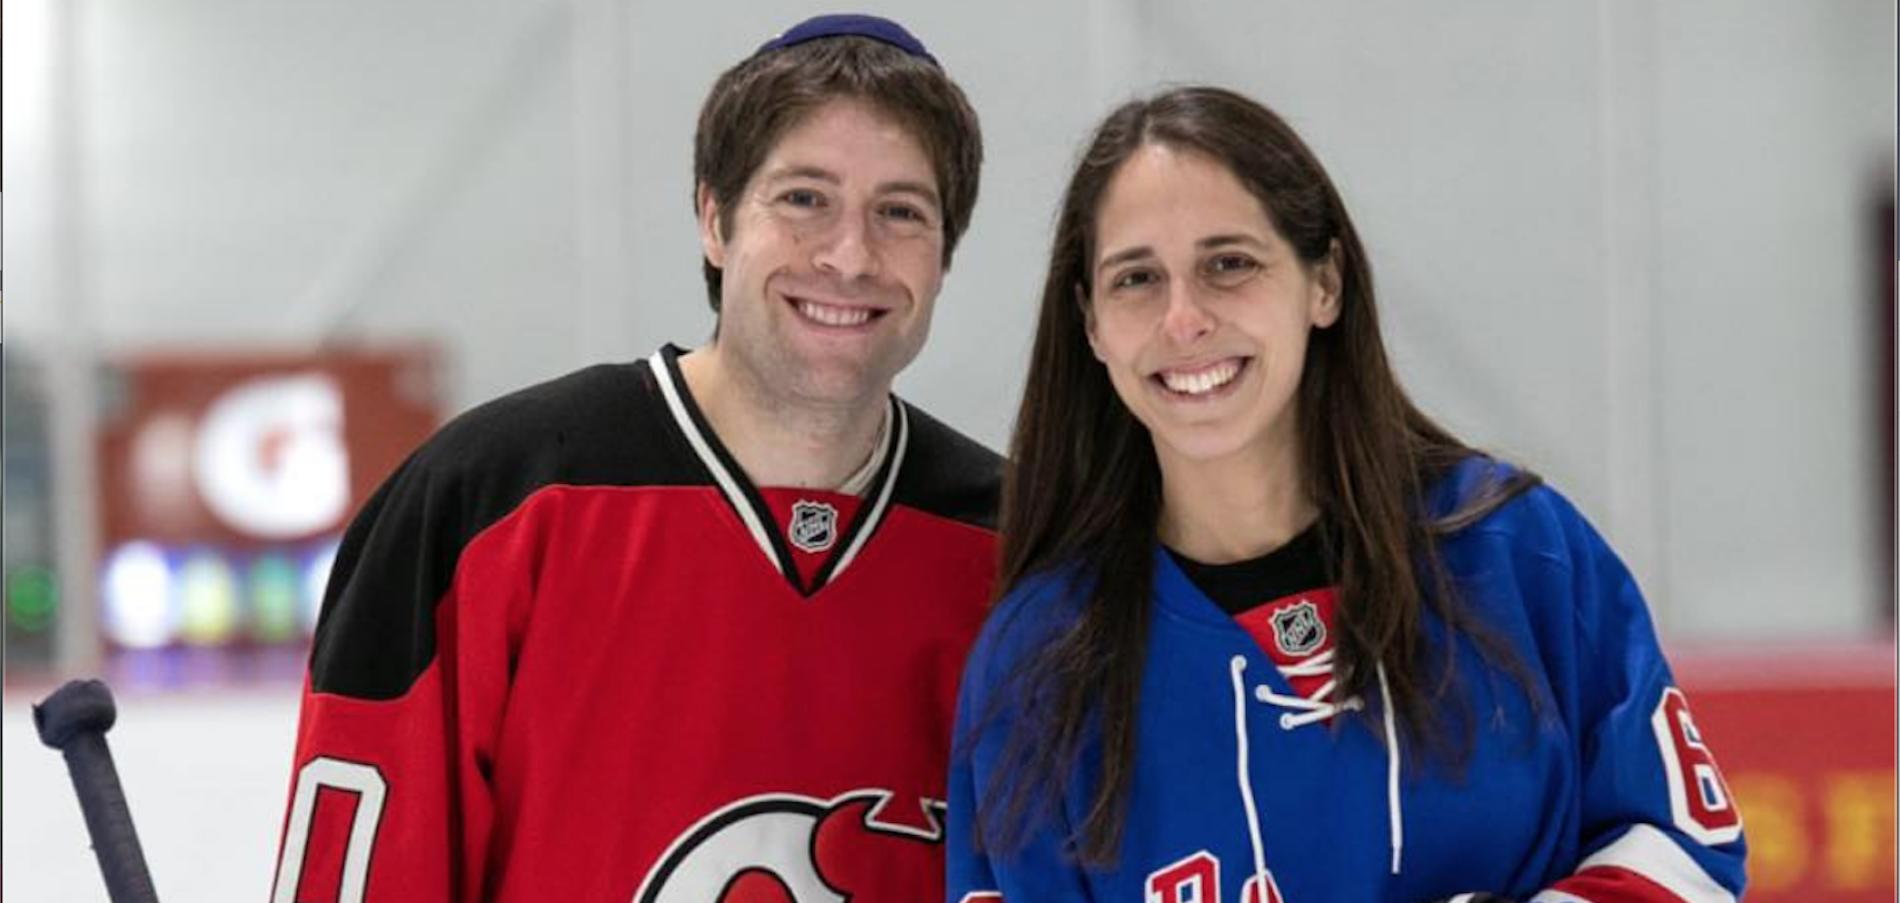 Aliza Hiller - The Orthodox Jewish Female Ice Hockey Player